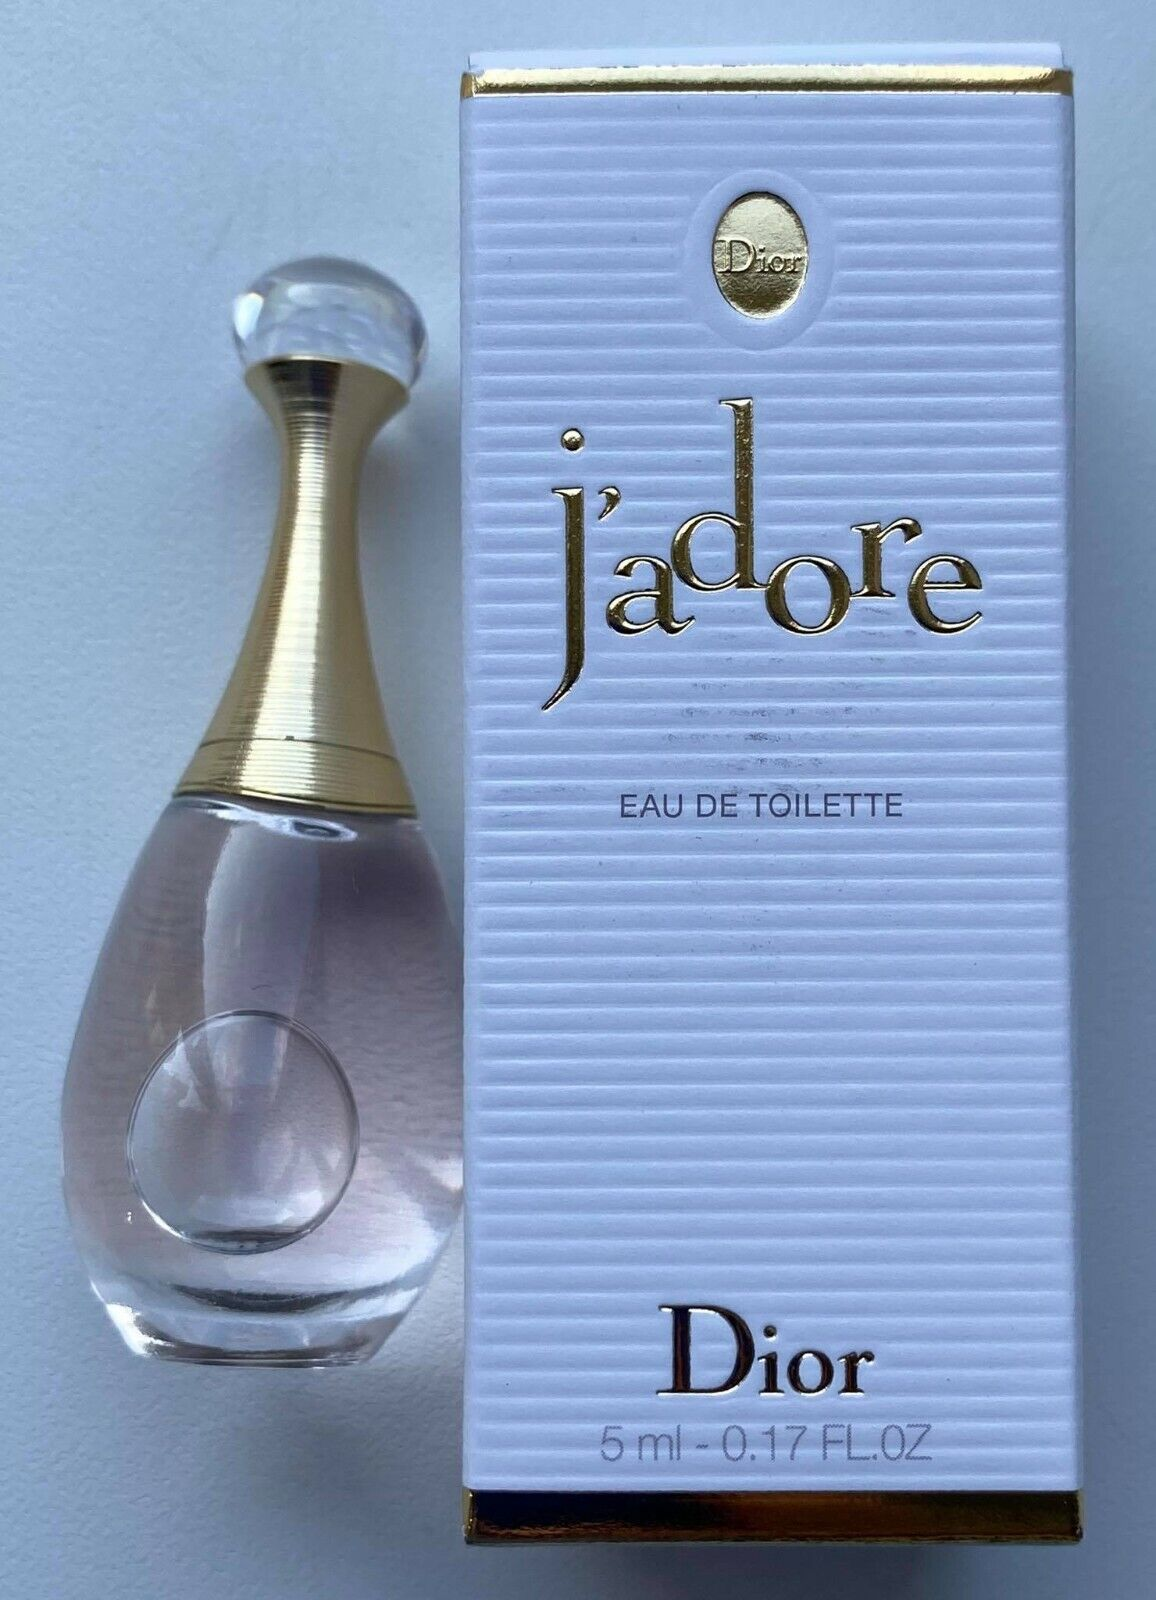 DIOR JADORE EAU DE TOILETTE 5 ml 0.17 FL OZ MINIATURE VIP GIFT